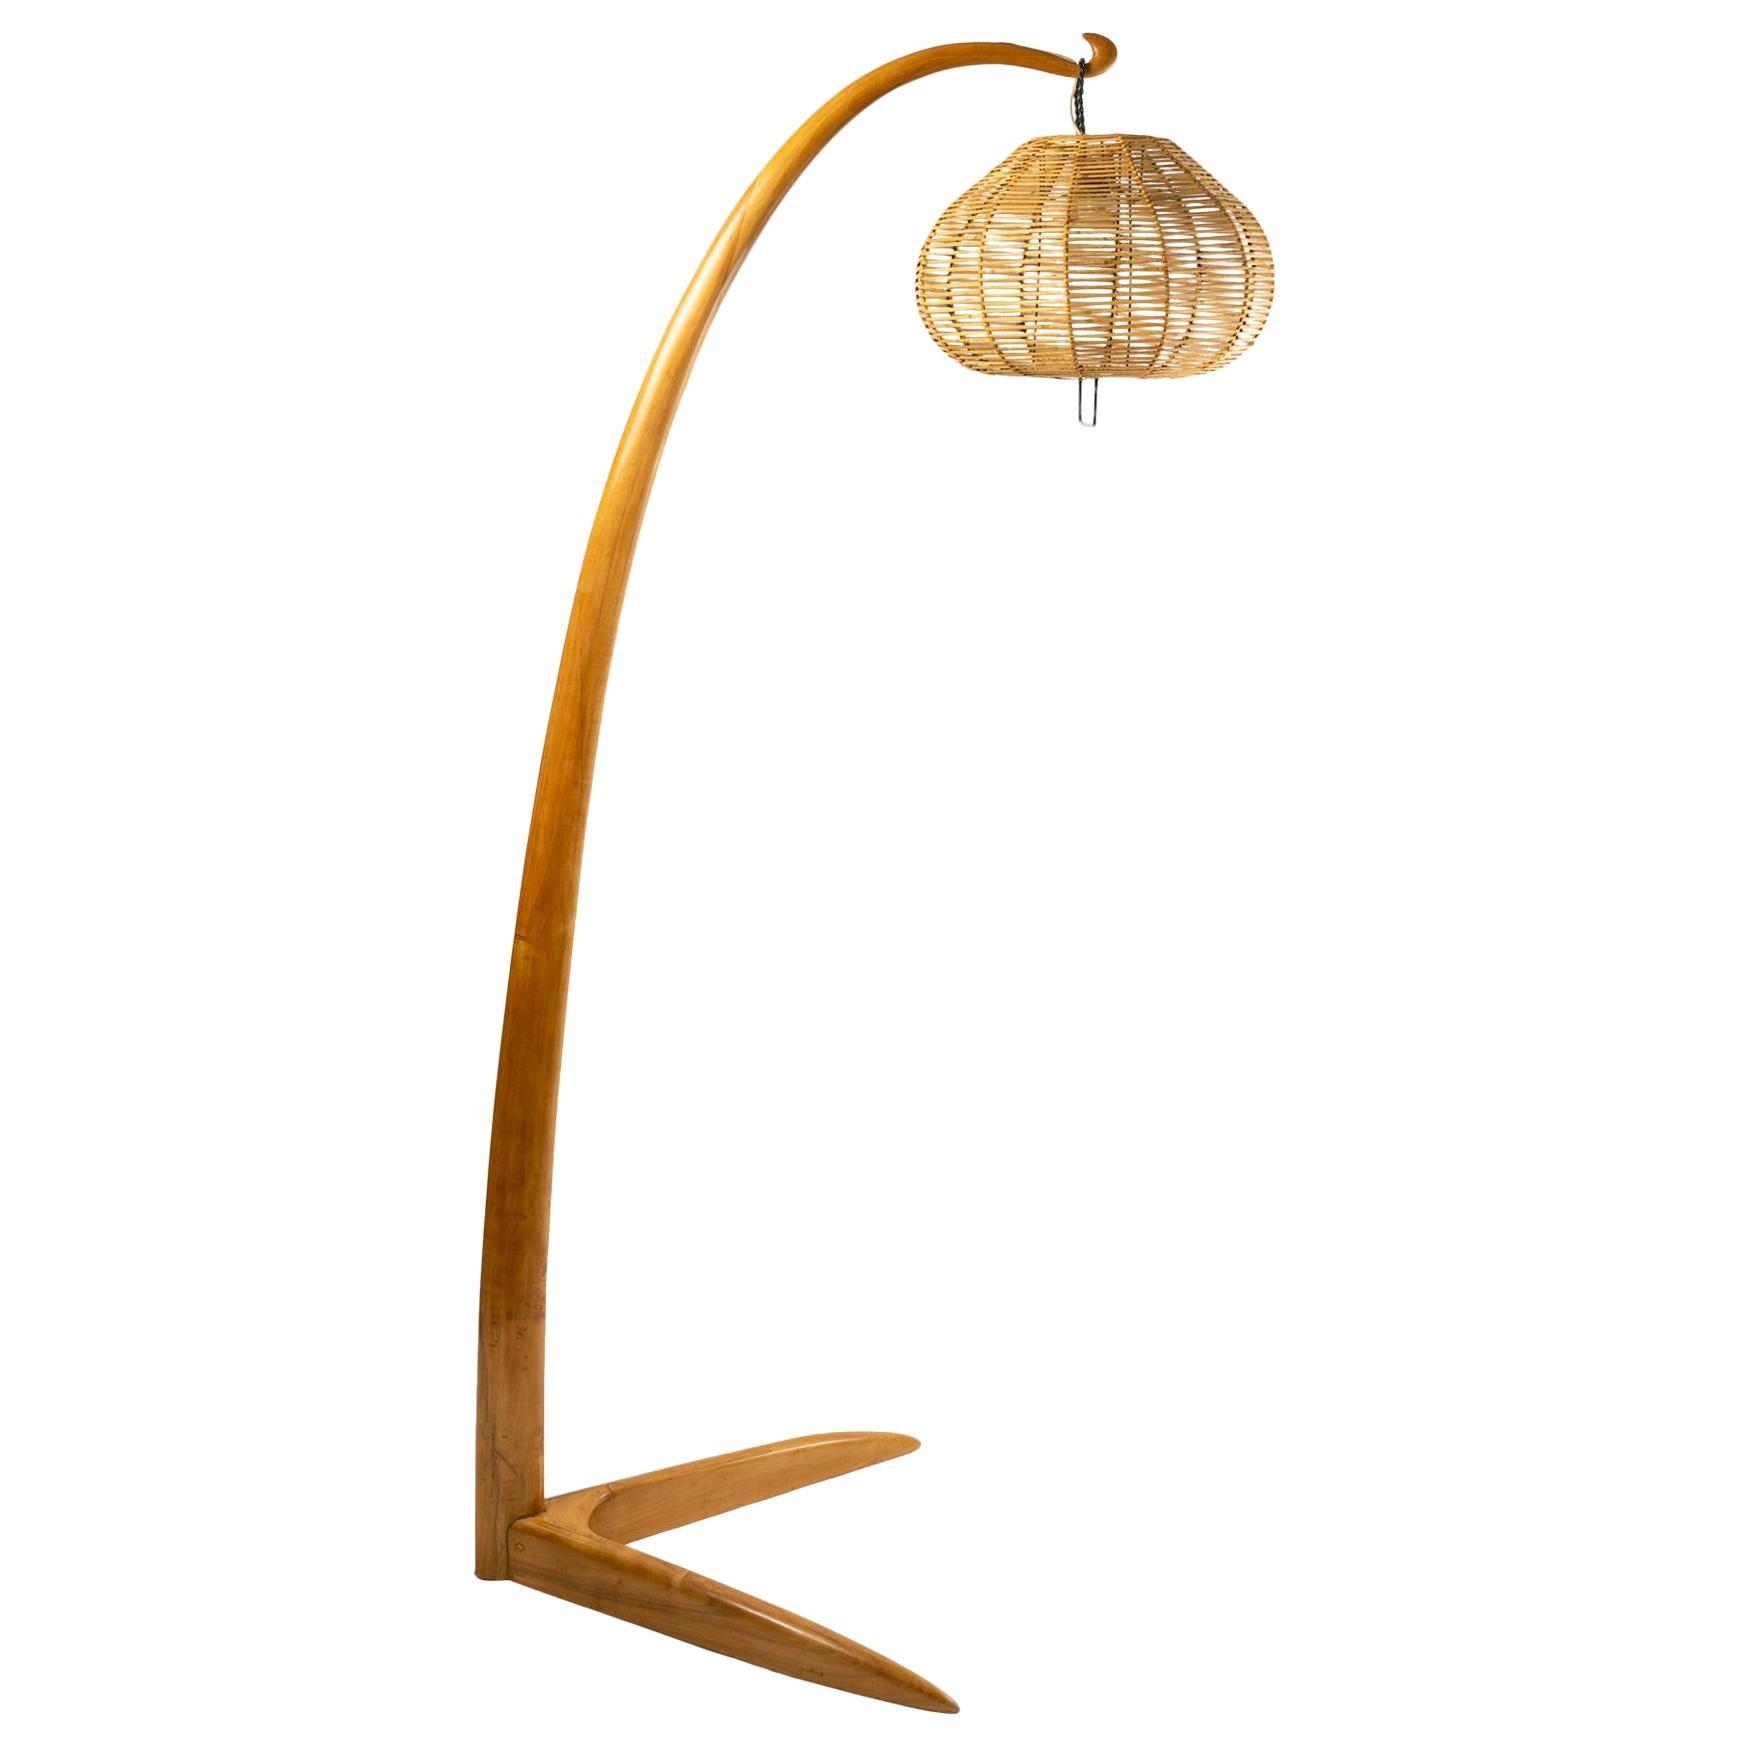 1950 Rispal Floor Lamp